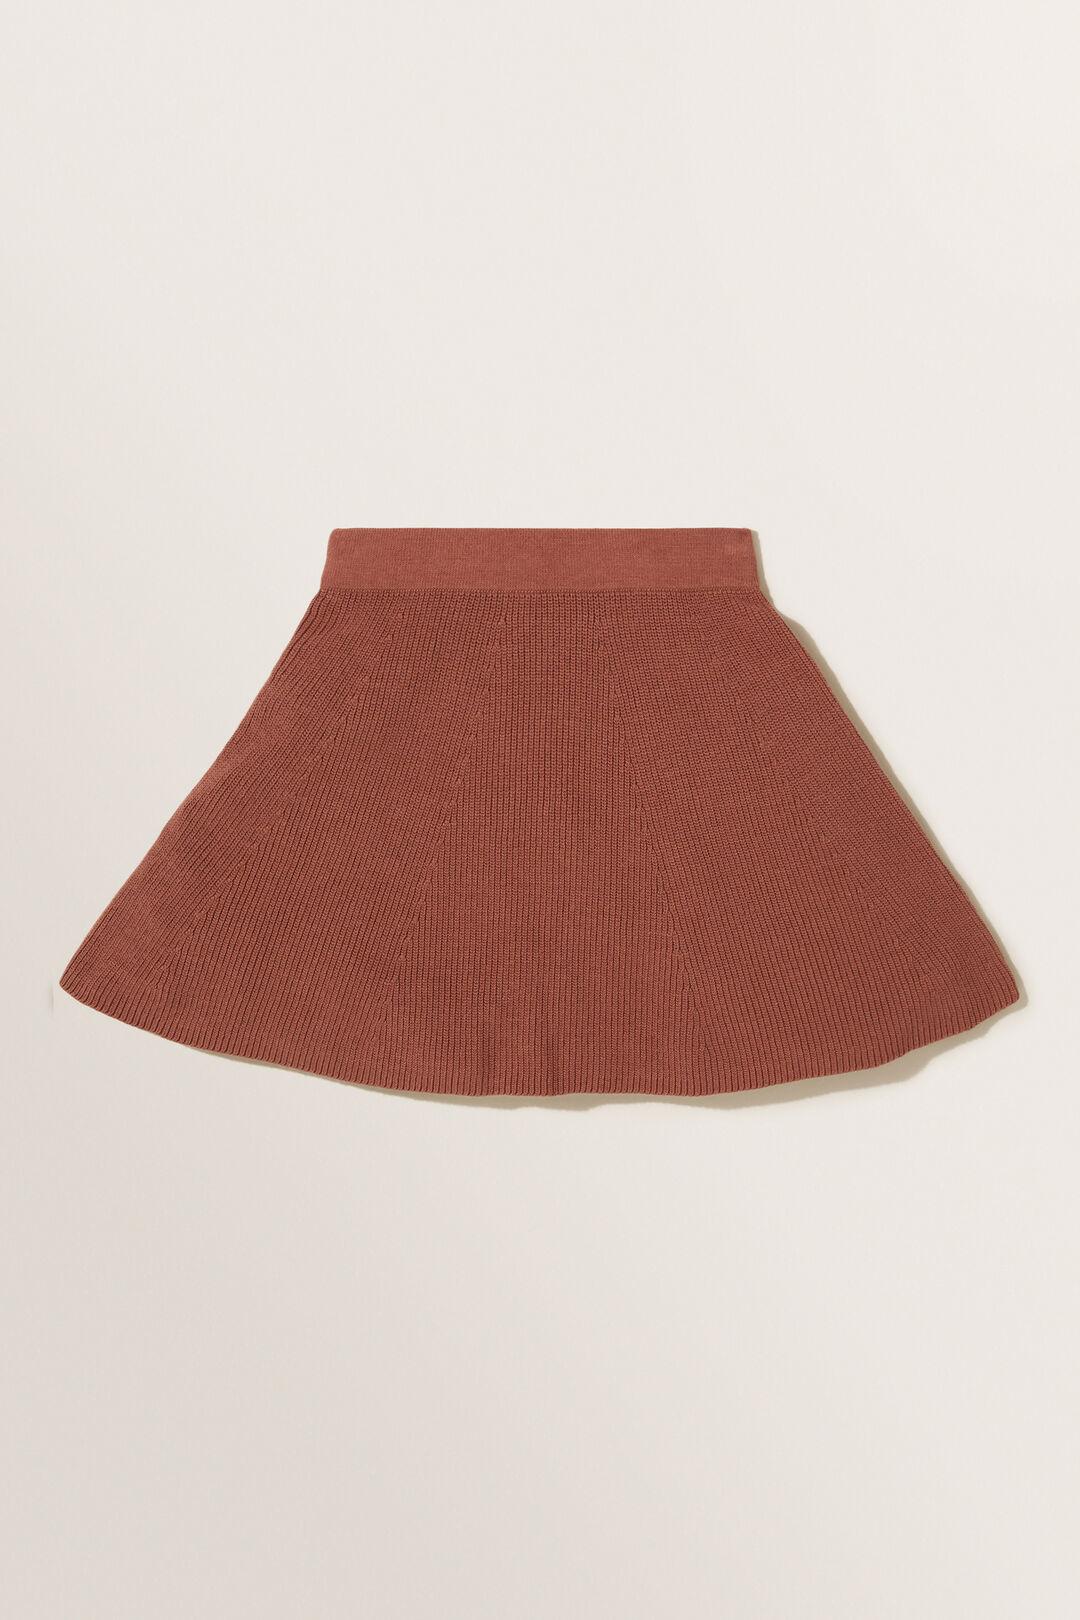 Knit Skirt  Cocoa  hi-res